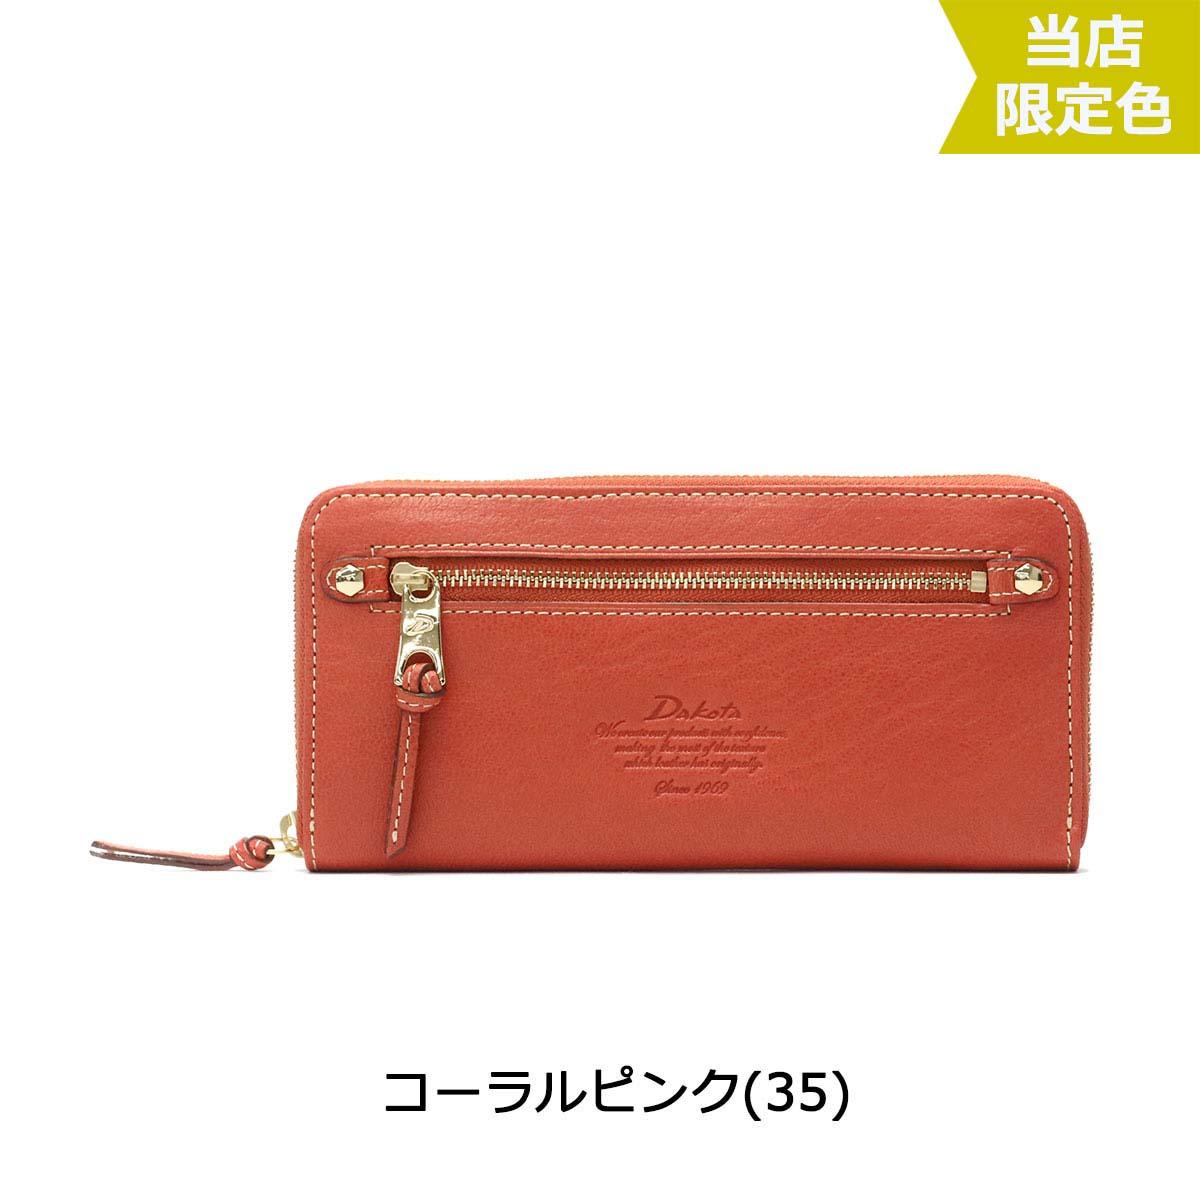 Dakota modelo long wallet round zipper ladies leather 0035088 (0034088)